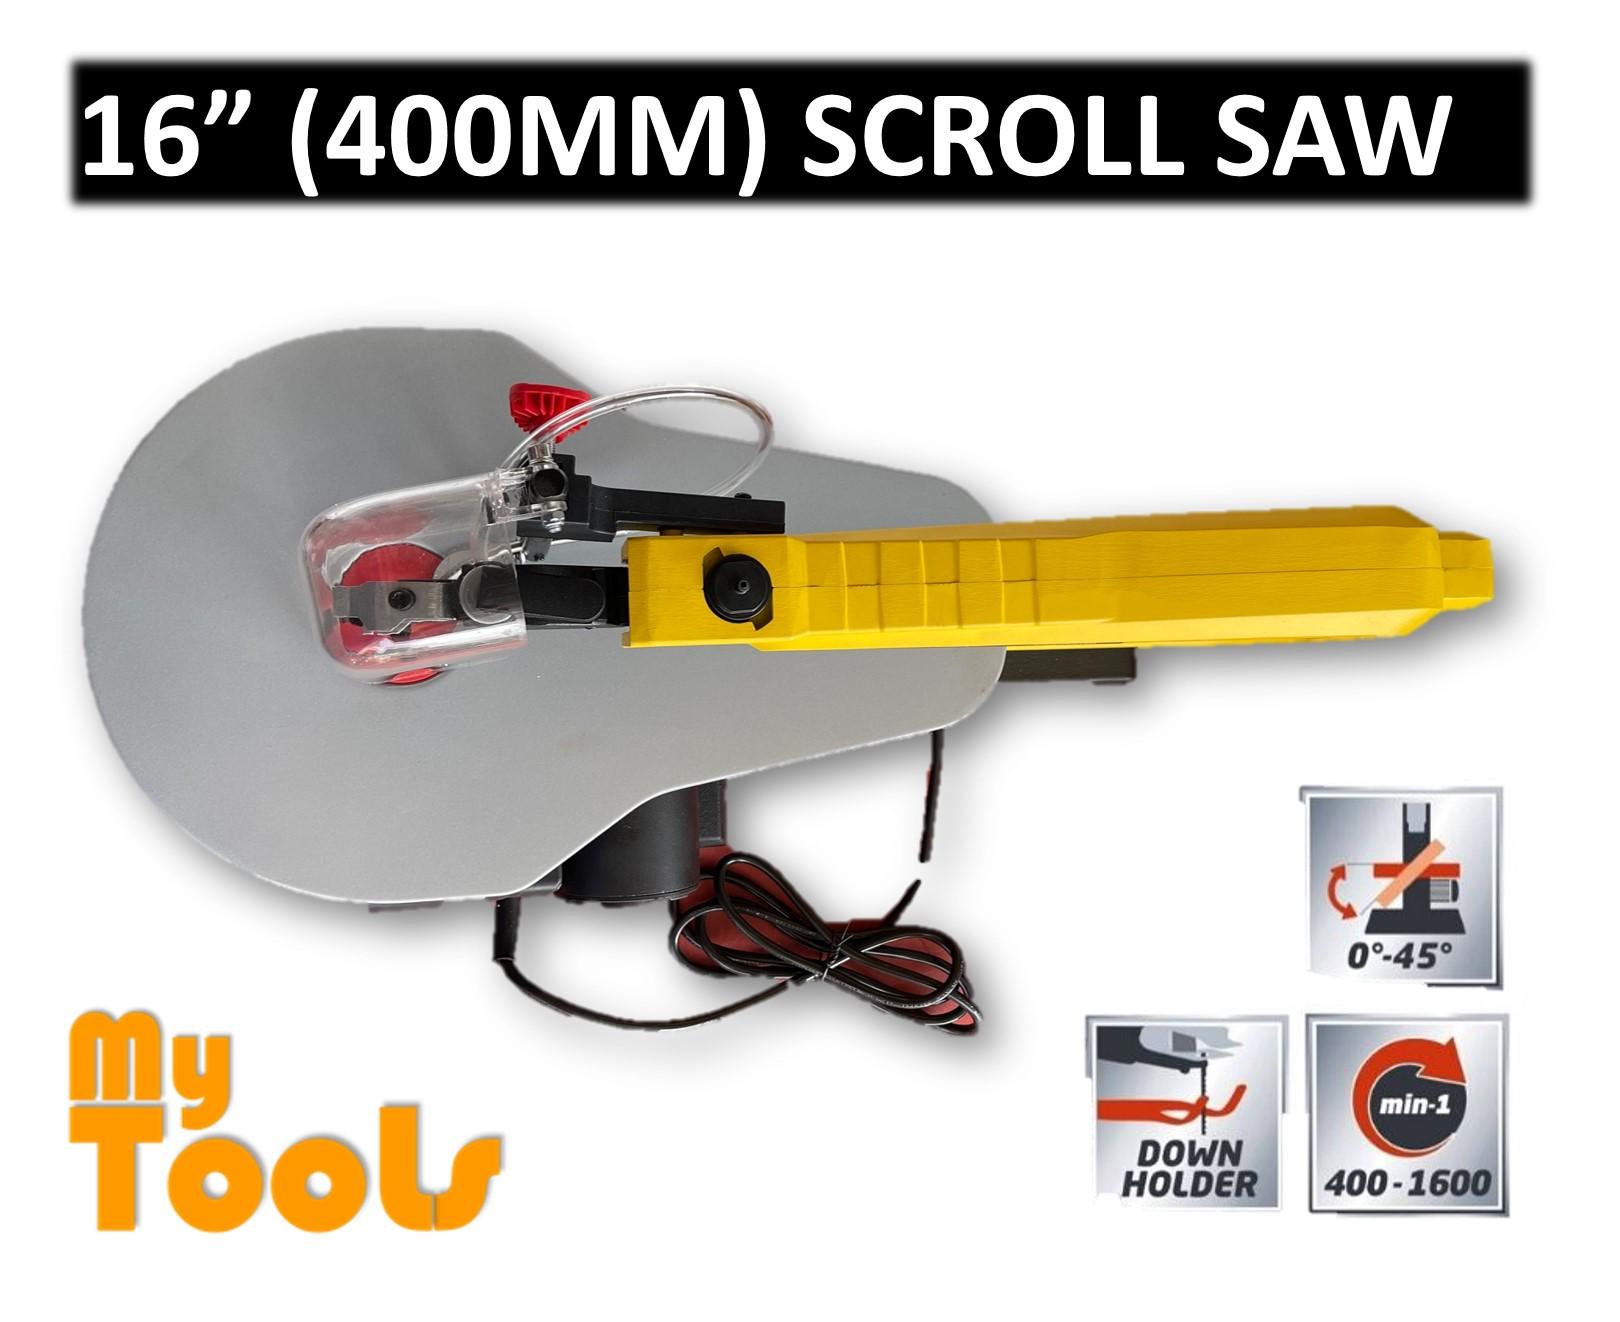 "Mytools 16"" (400mm) Professional Scroll Saw Machine"